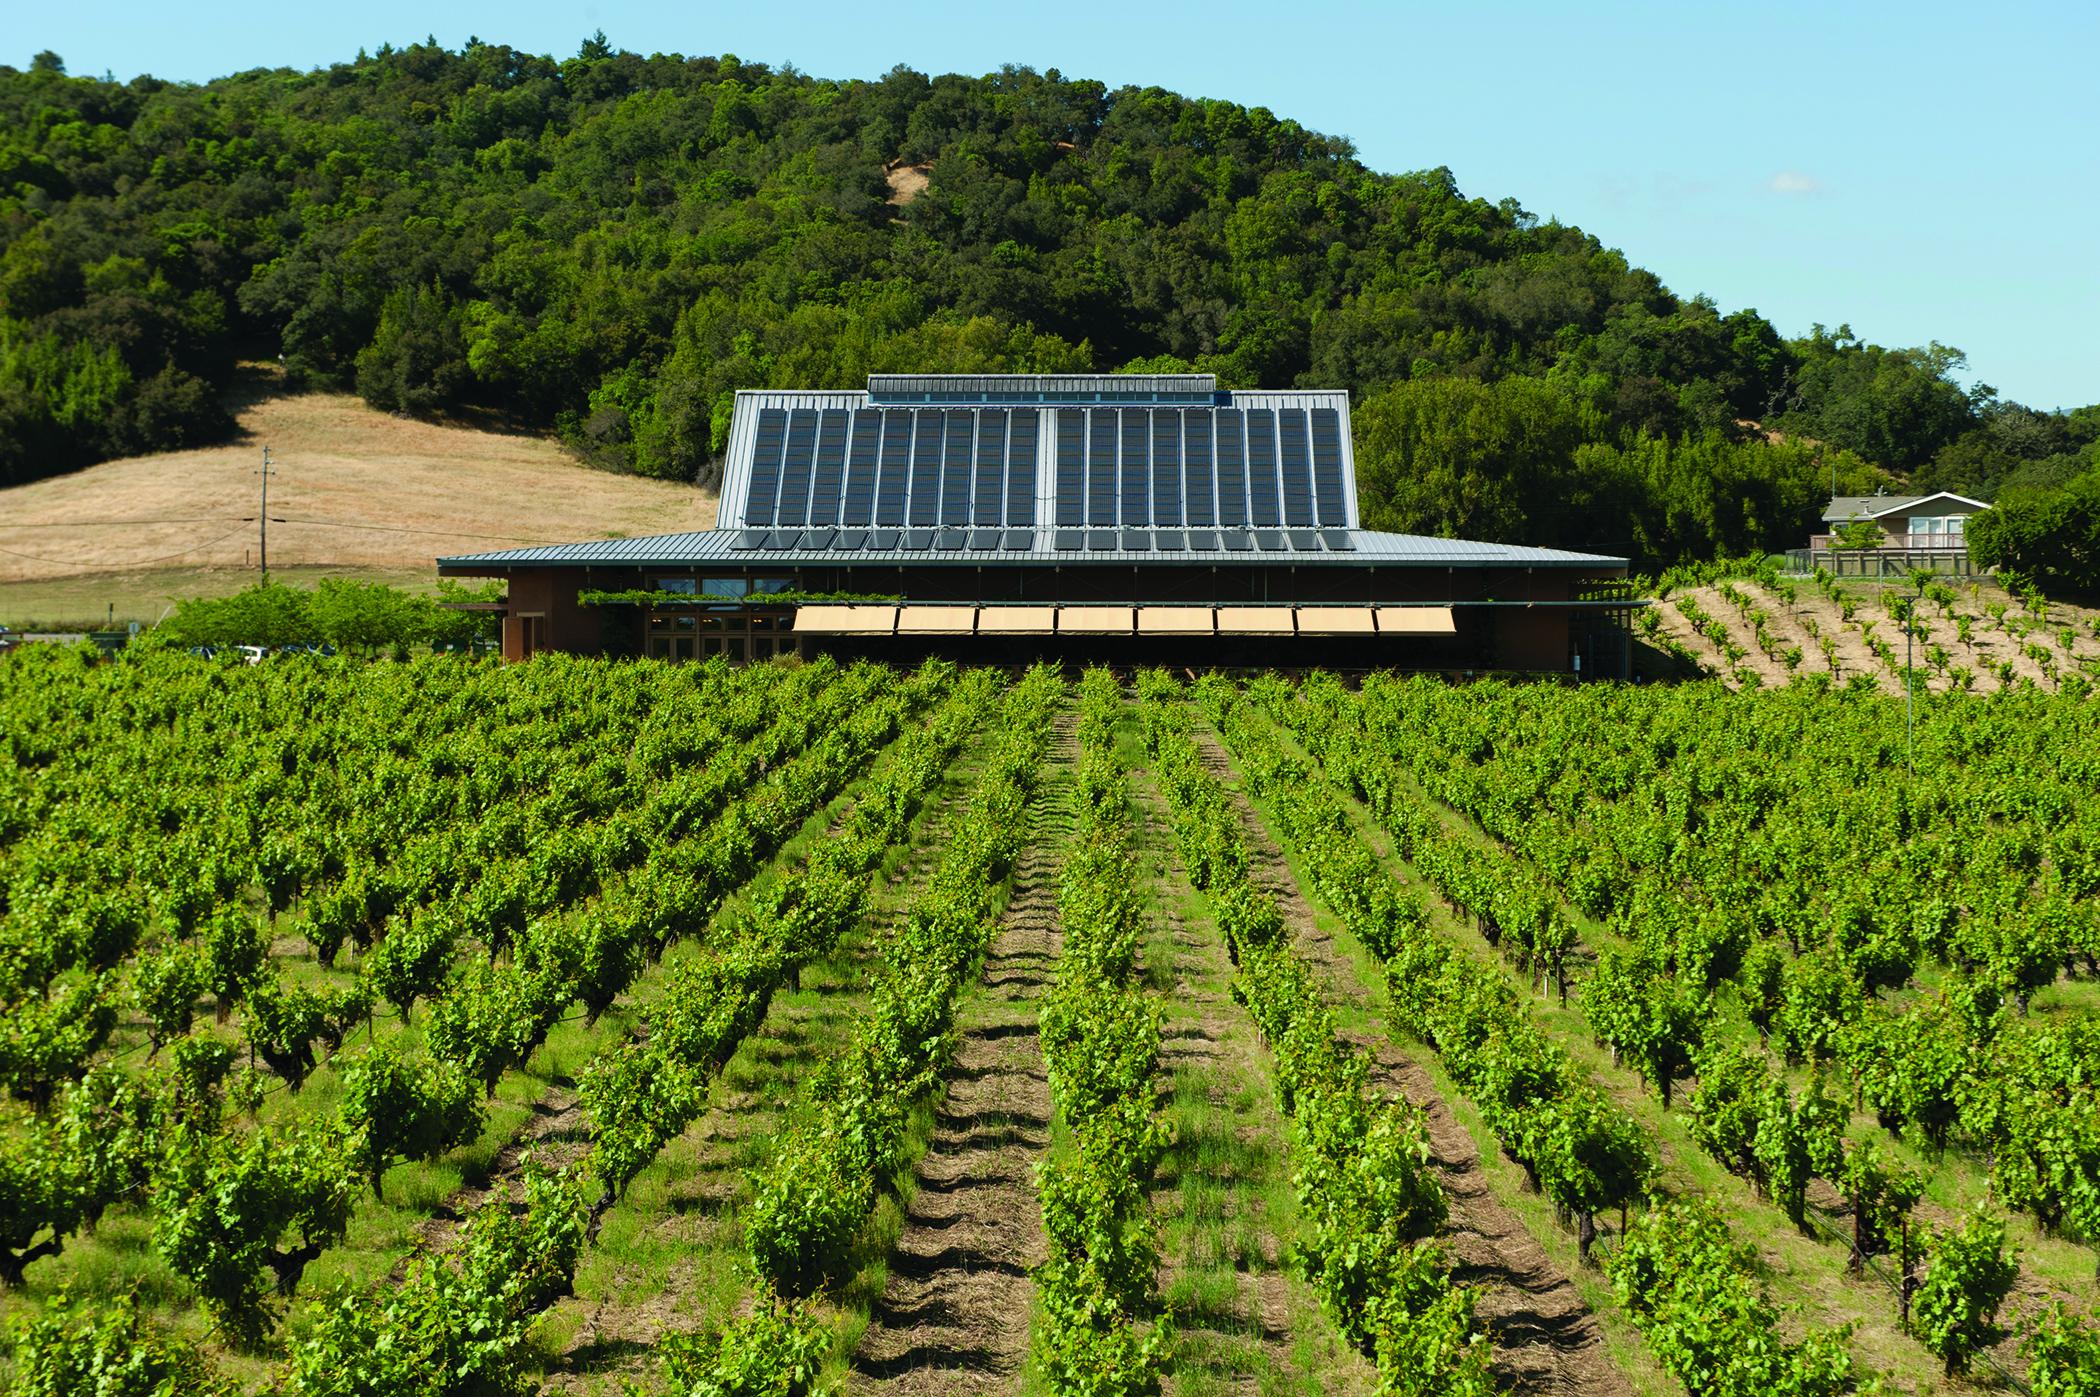 Ridge Vineyards, Lytton Springs, Dry Creek, Sonoma County